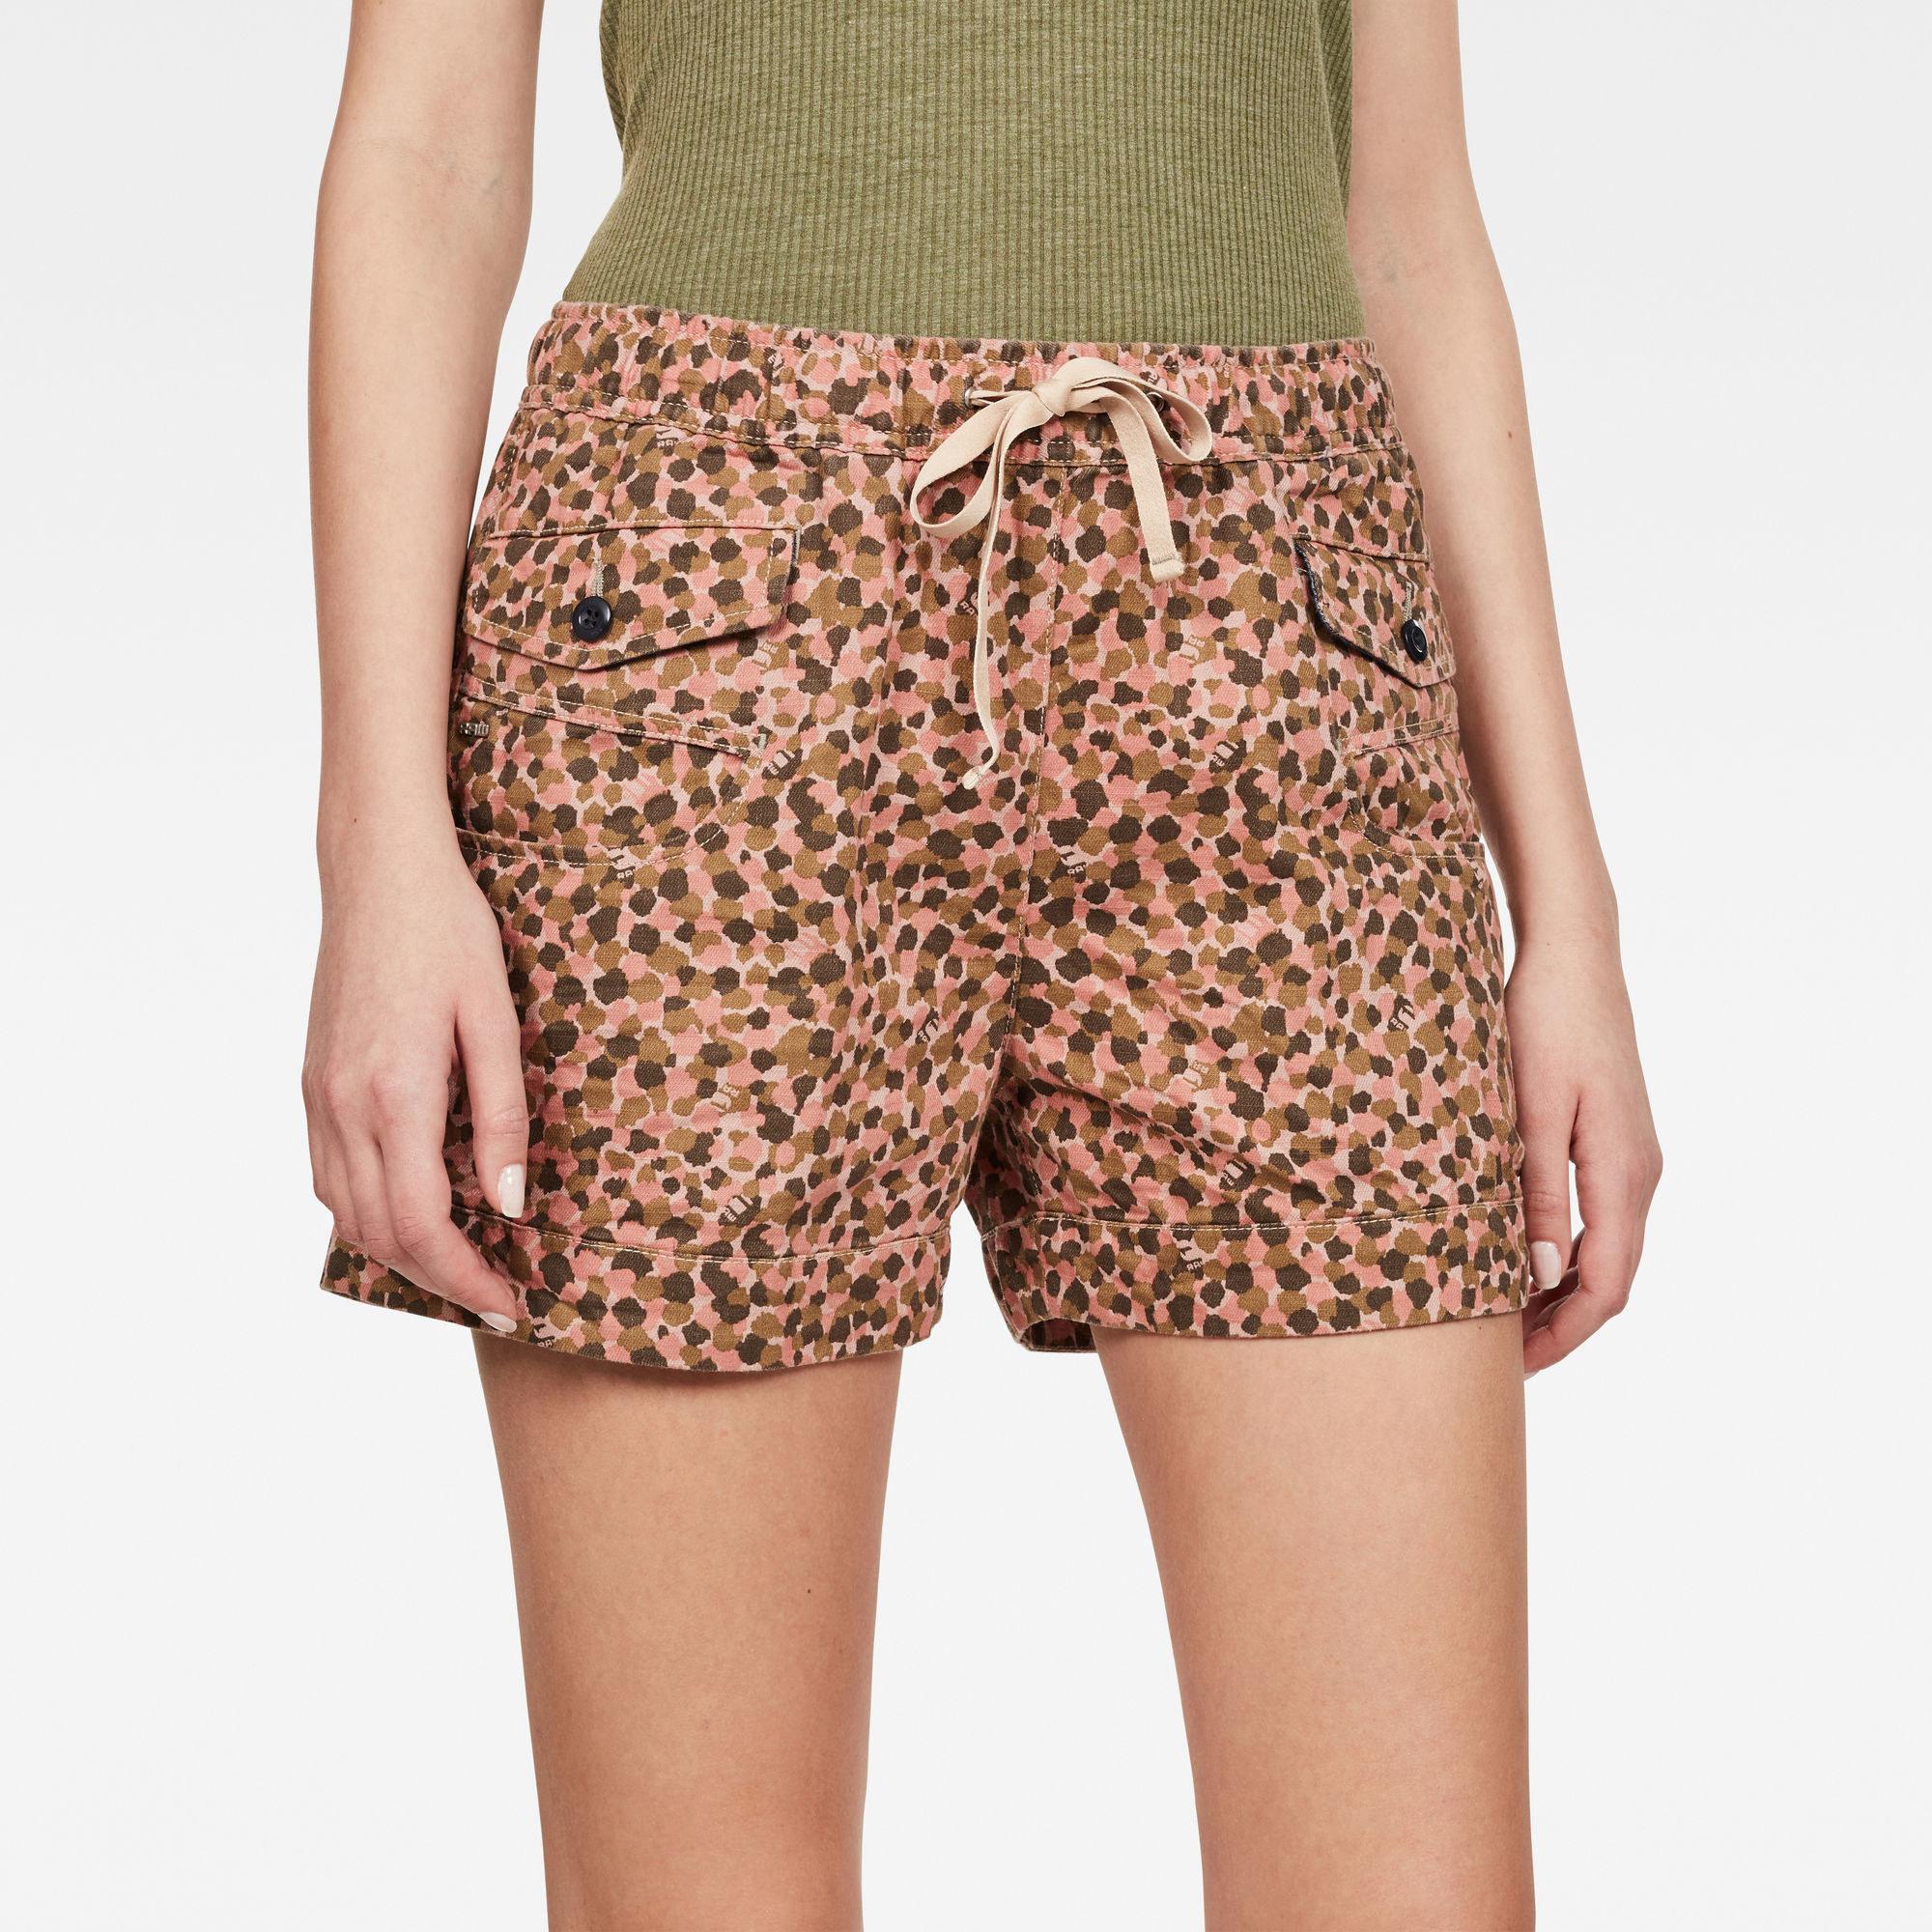 A model wears the dot-patterned shorts